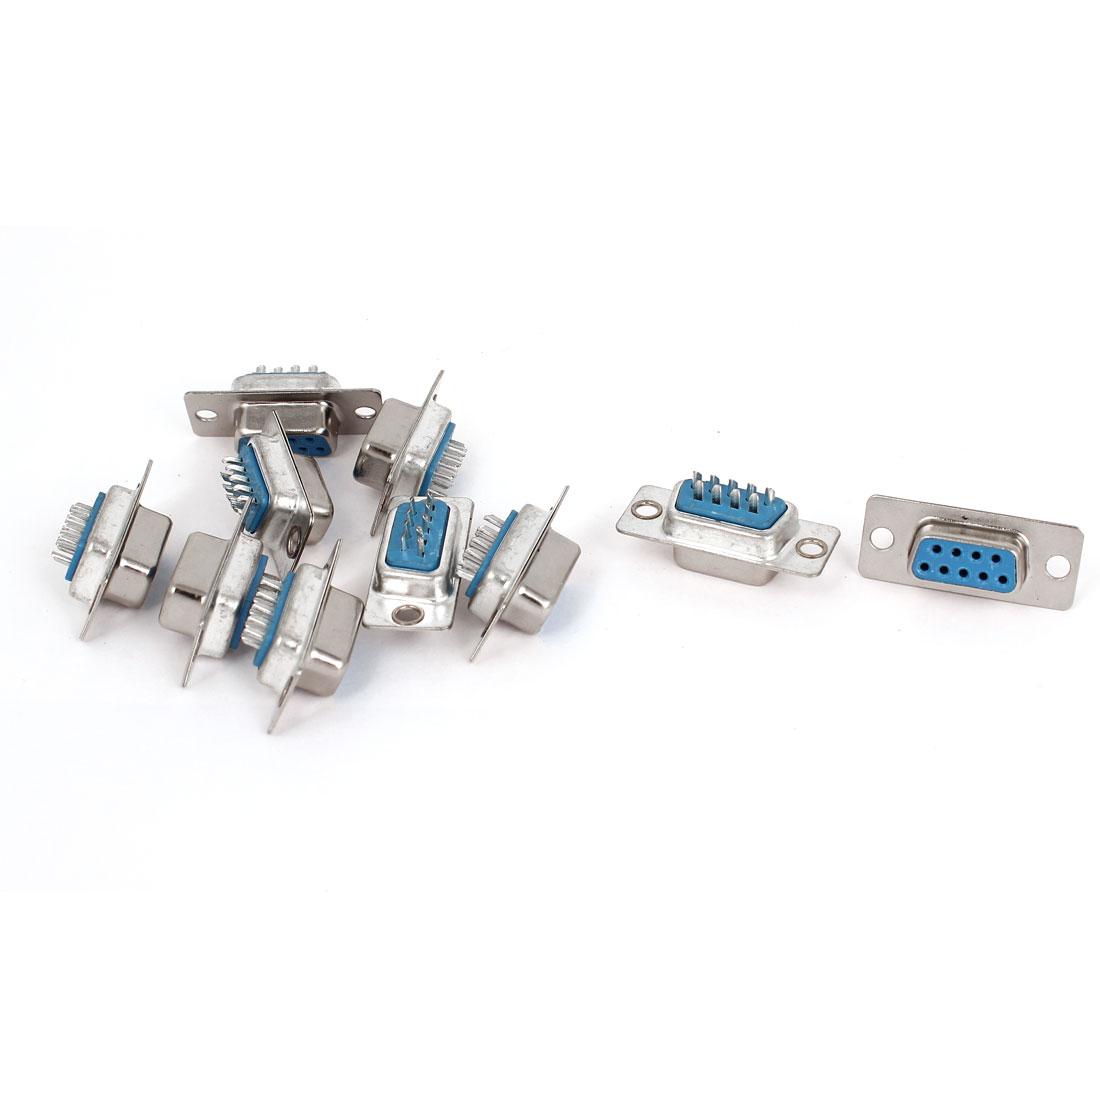 10pcs RS232 DB9 9 Pin Female Port DIP Mount VGA Socket Connector Adapter